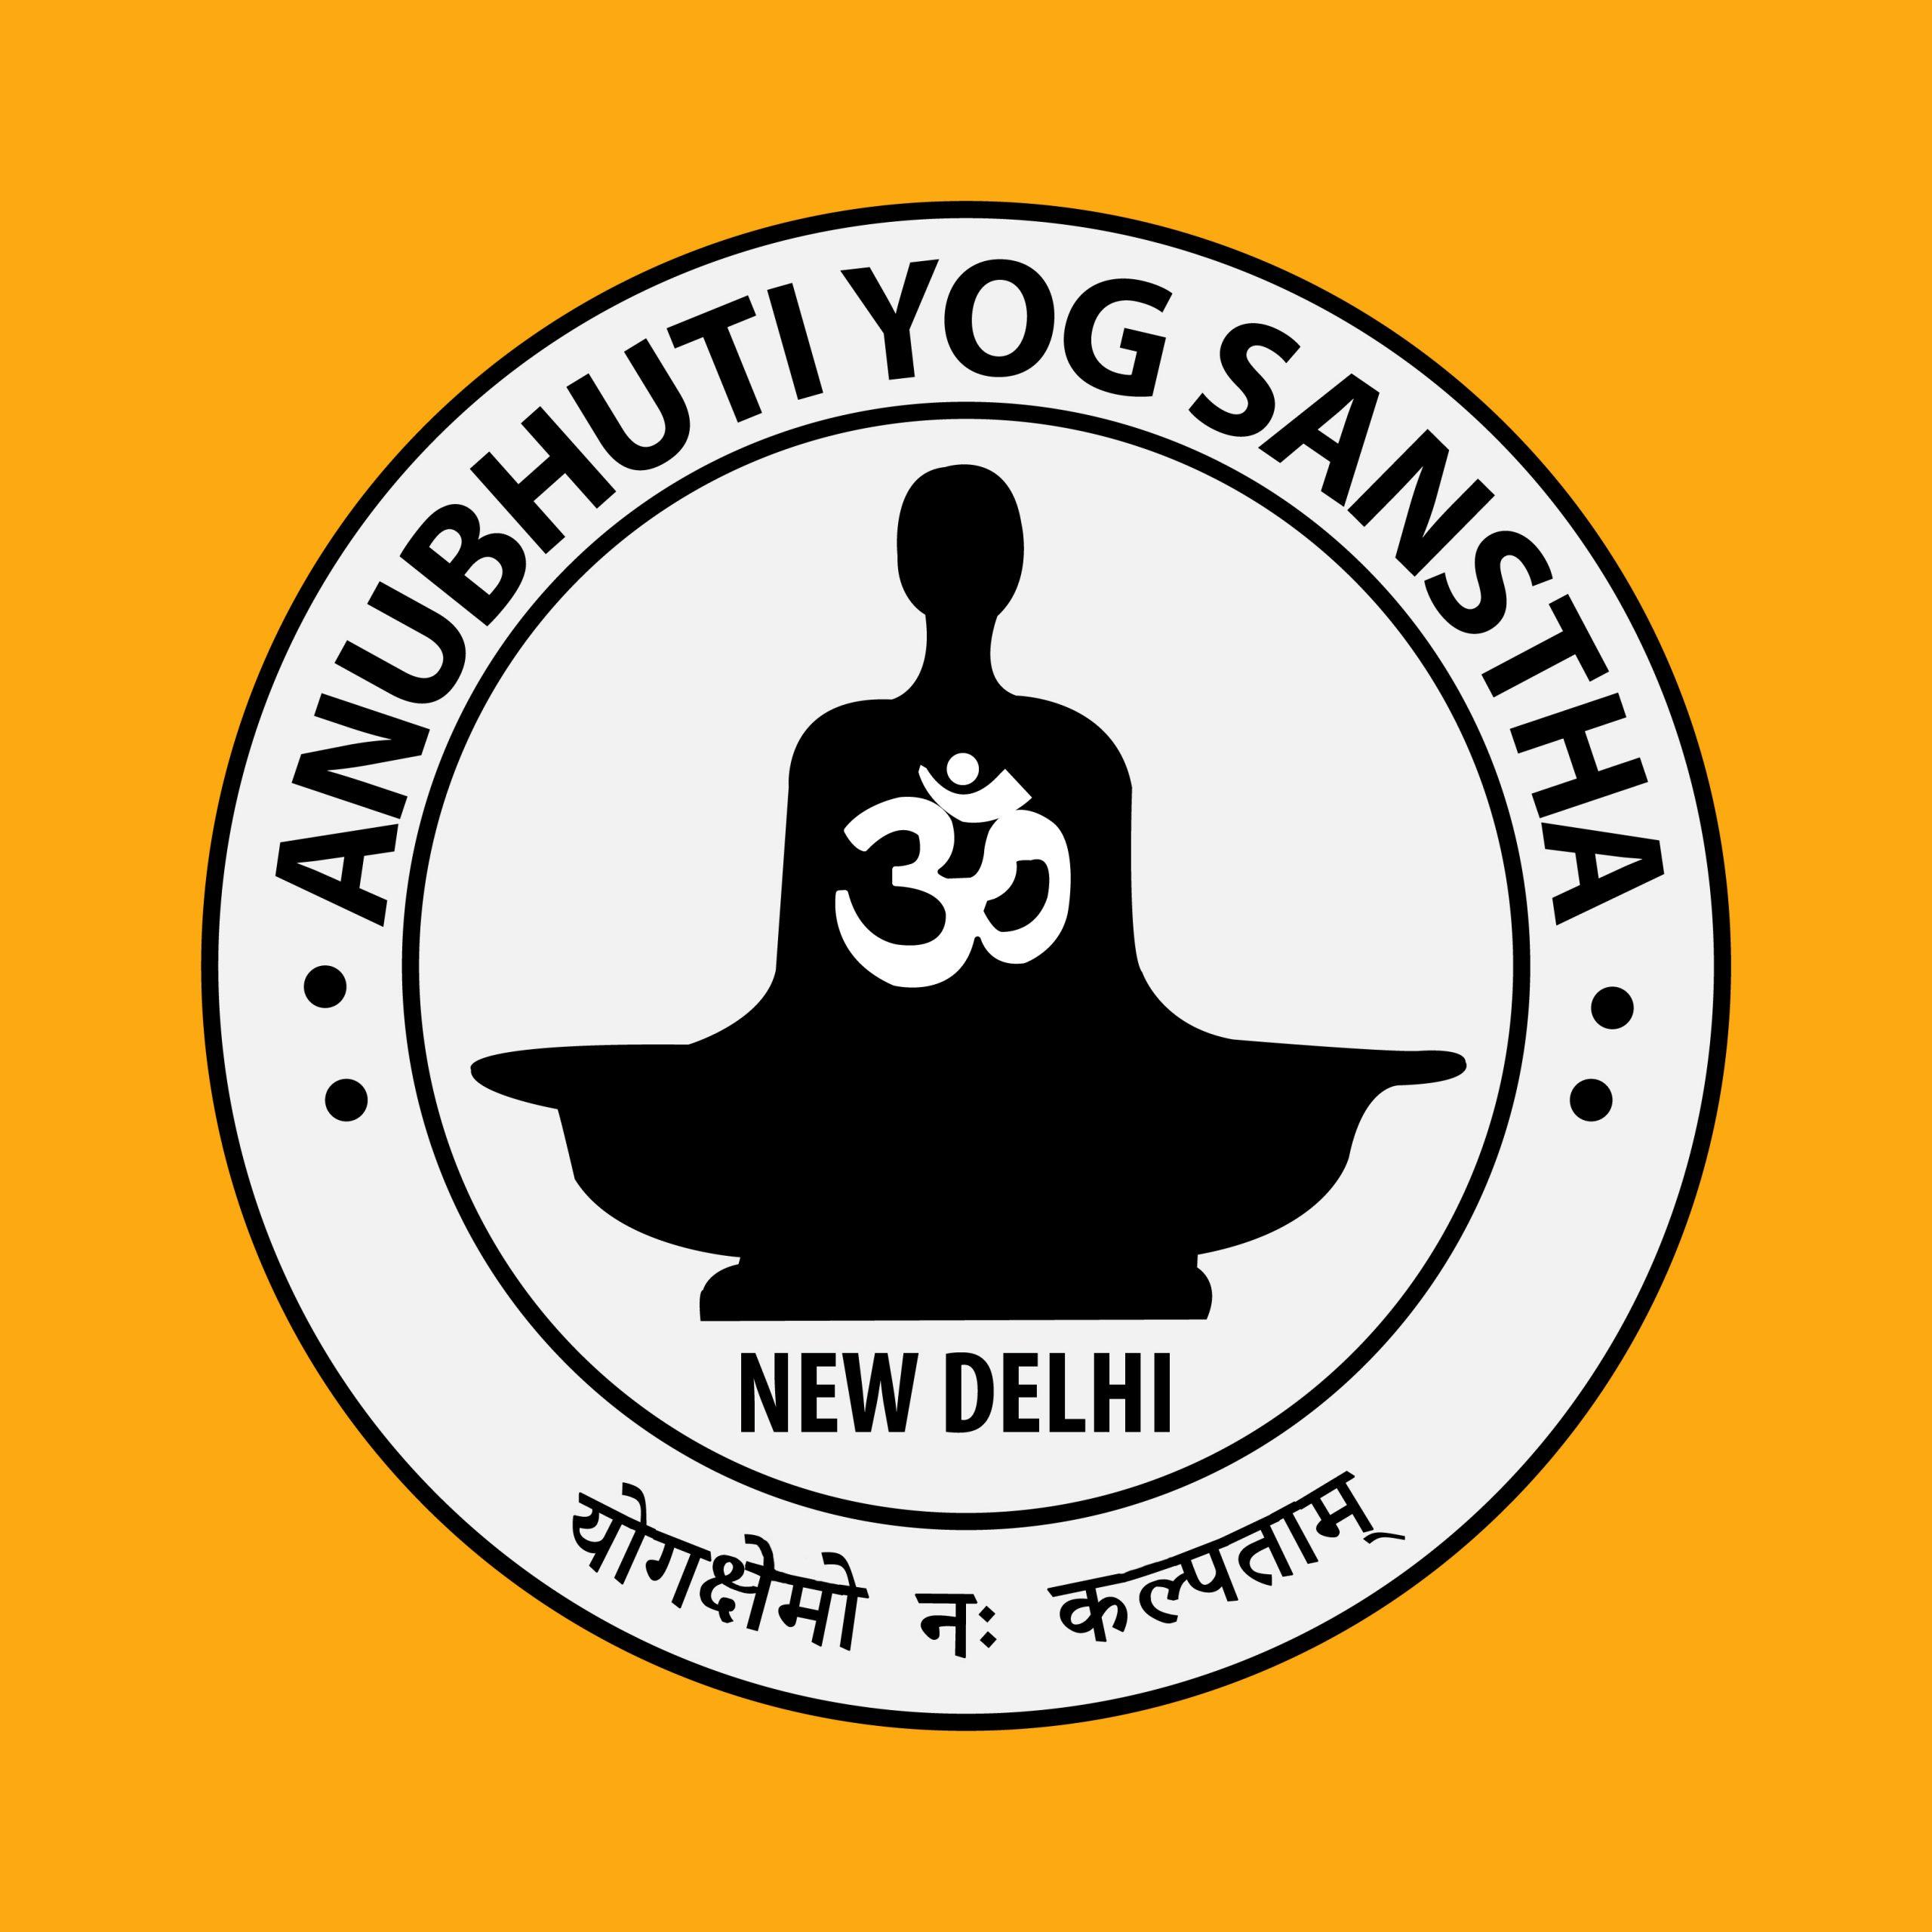 Anubhati Yog Sanstha